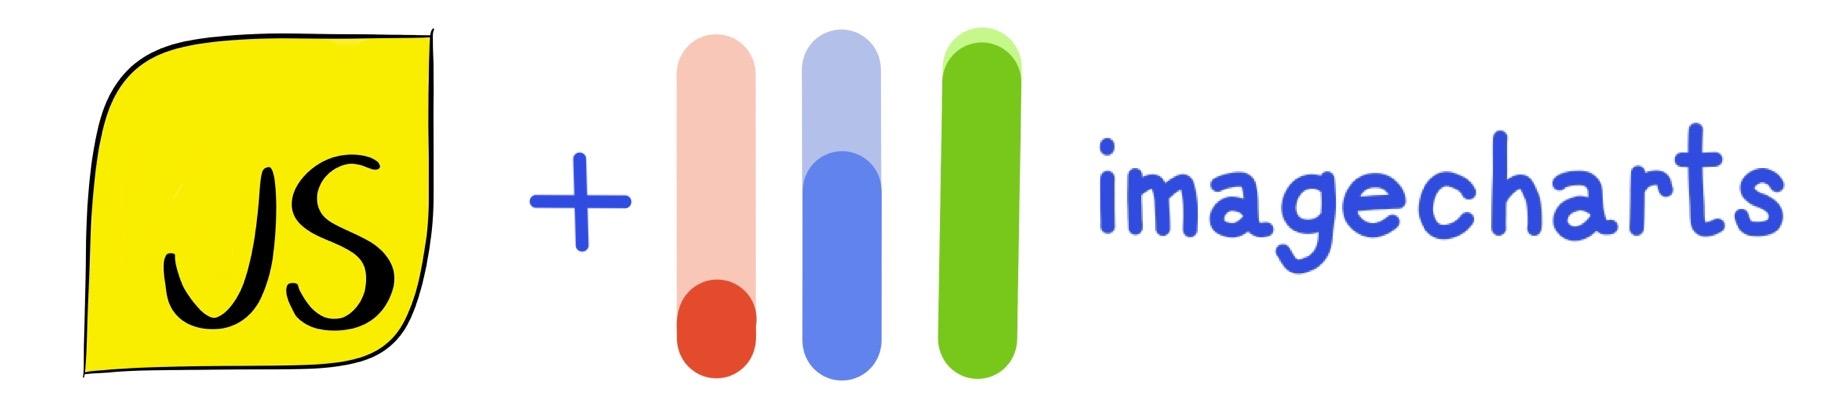 image charts javascript library logo